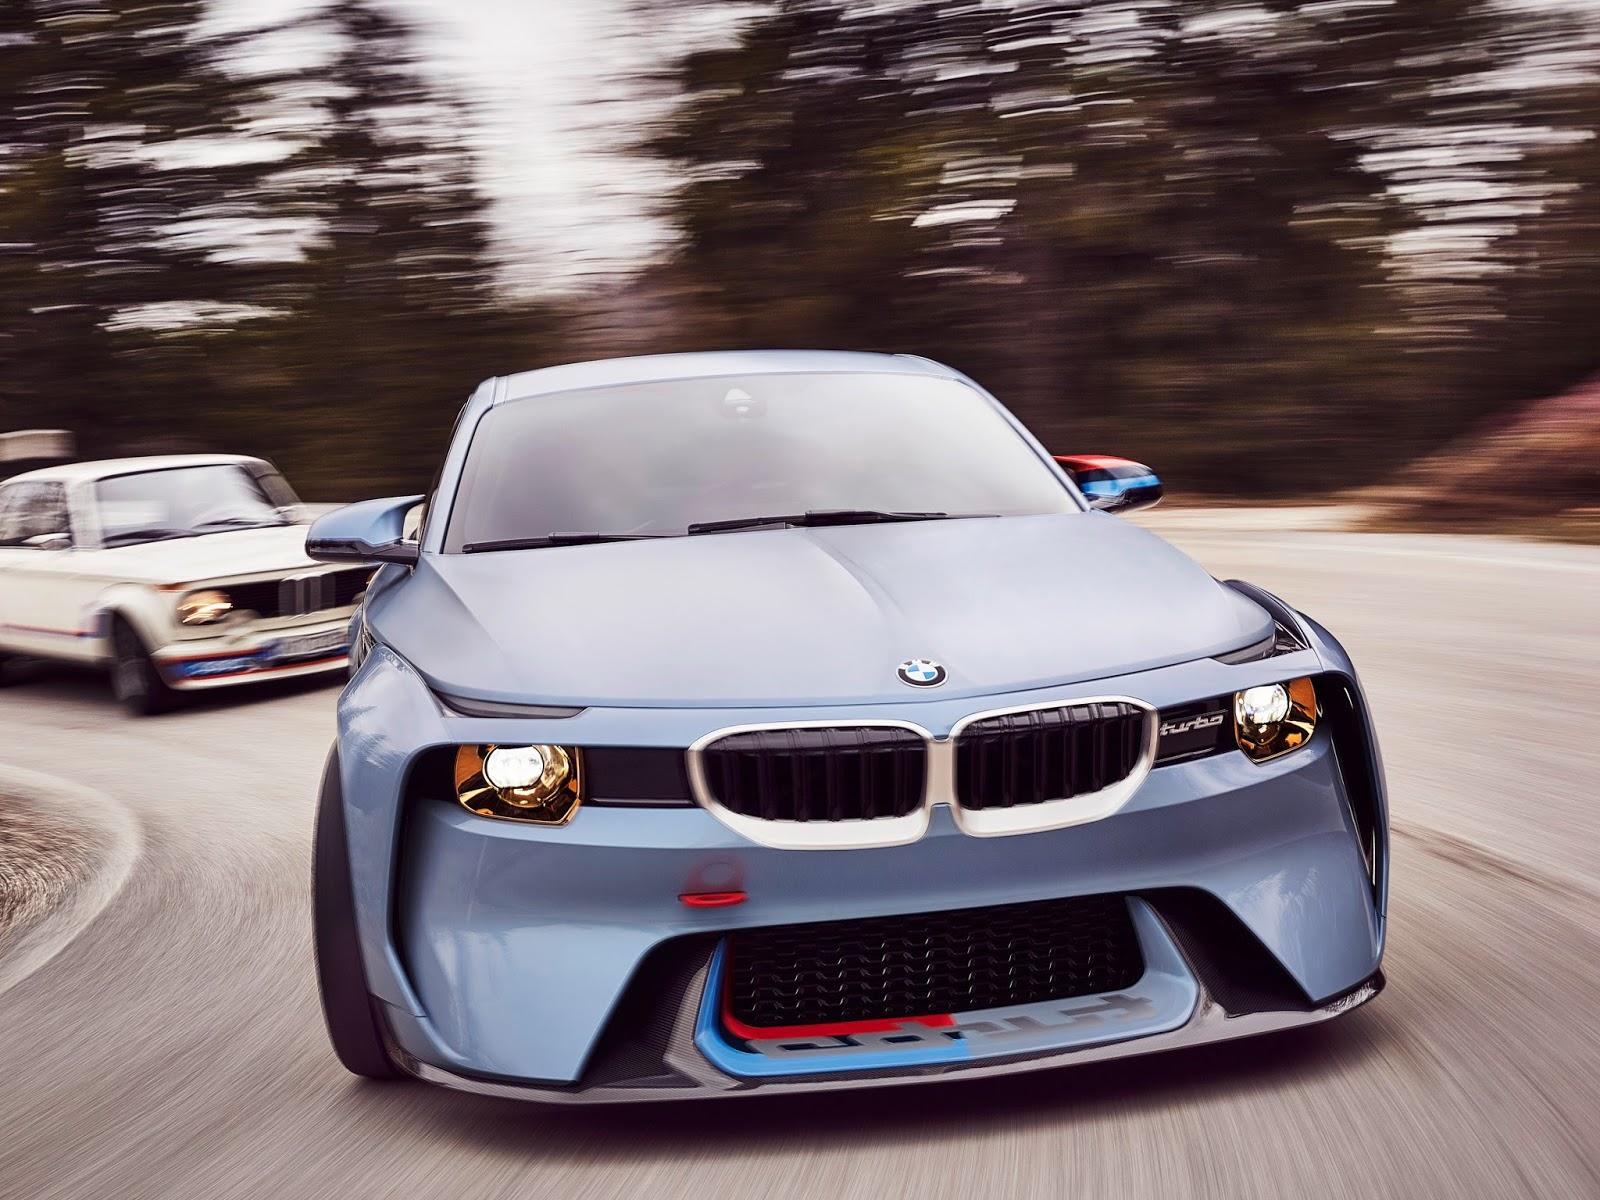 P90219728 highRes bmw 2002 hommage 05 1 1 H BMW γιορτάζει τα 50 χρόνια της θρυλικής 2002 turbo και παρουσιάζει την Bmw 2002 Hommage BMW, BMW 2002, BMW 2002 turbo, BMW Concept, BMW Hommage, supercars, videos